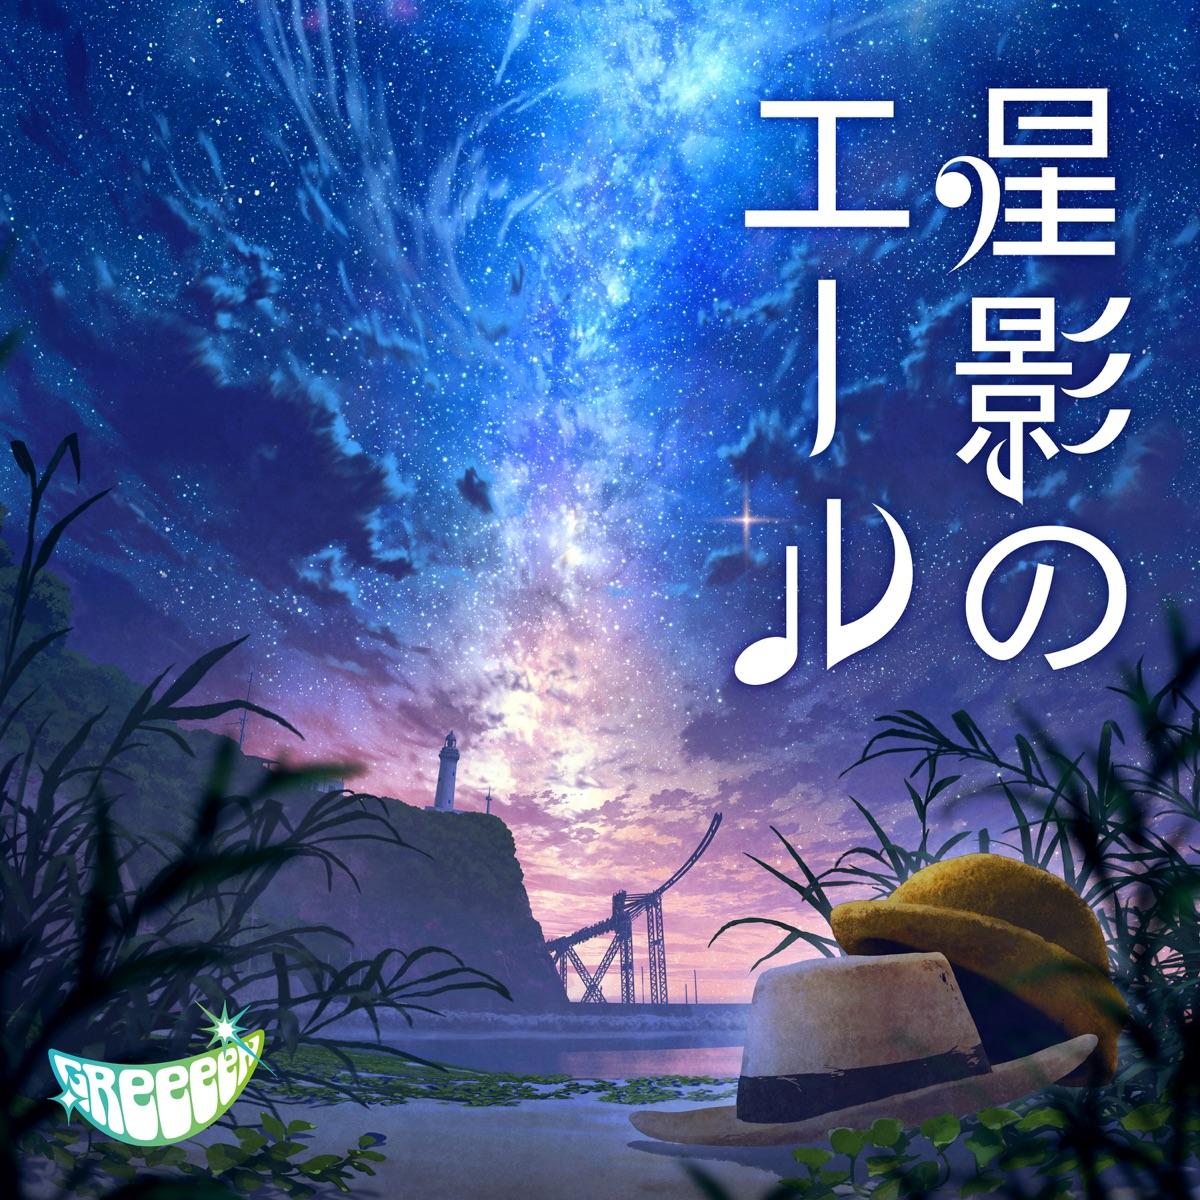 『GReeeeN - ハロー グッバイ by